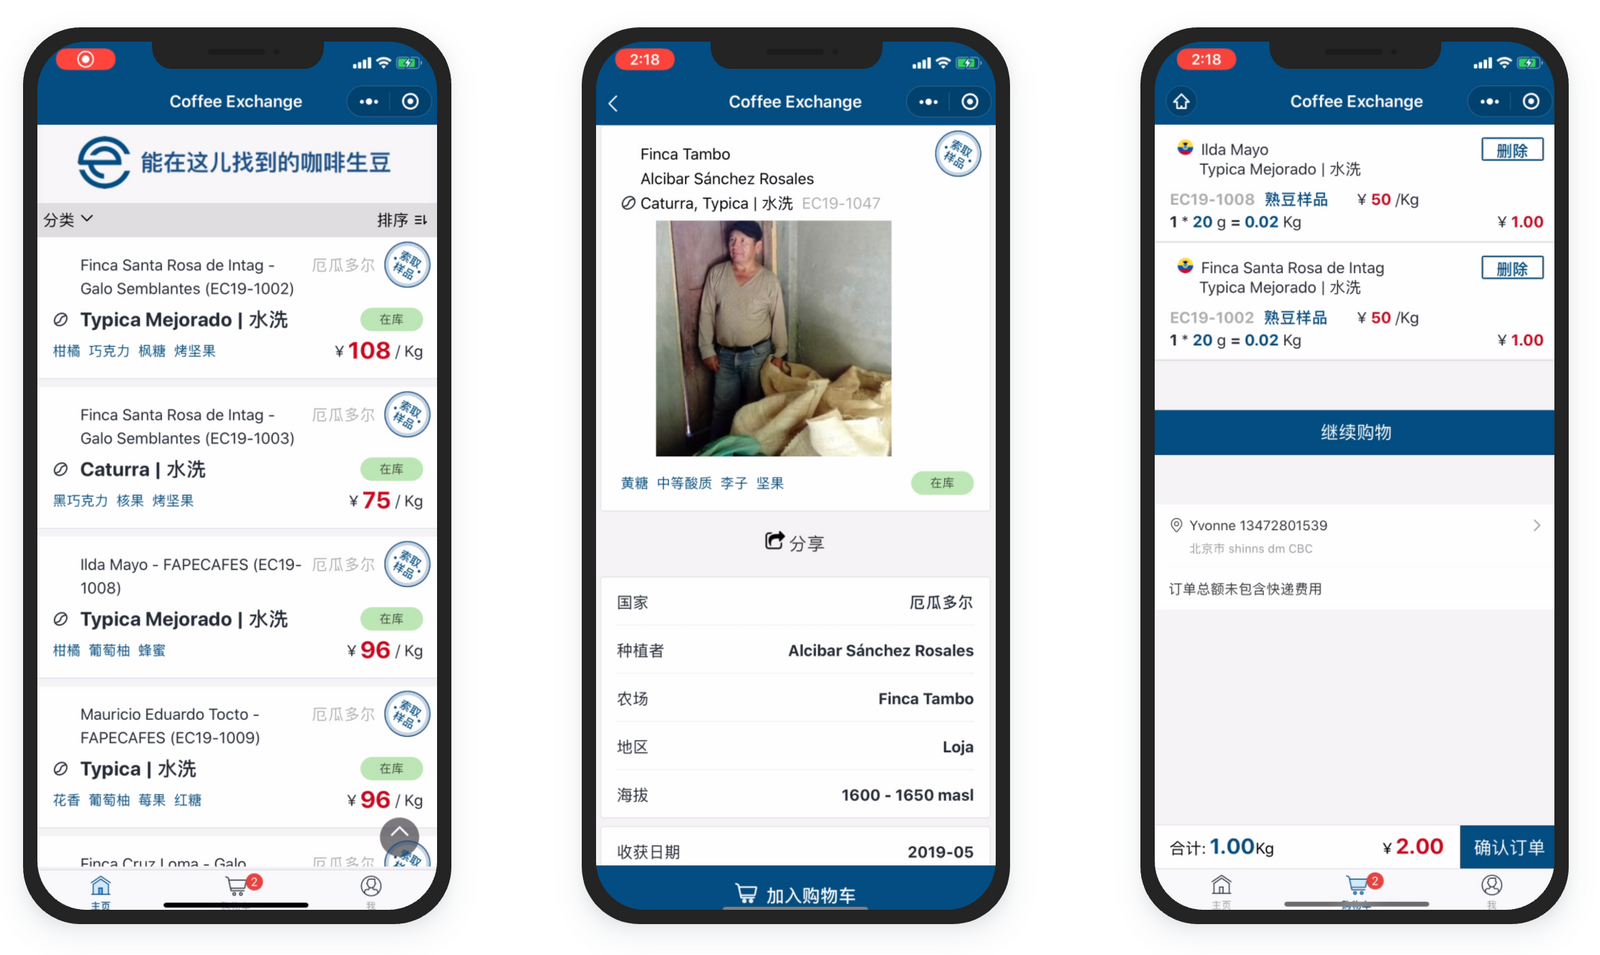 Coffee Exchange's original App design